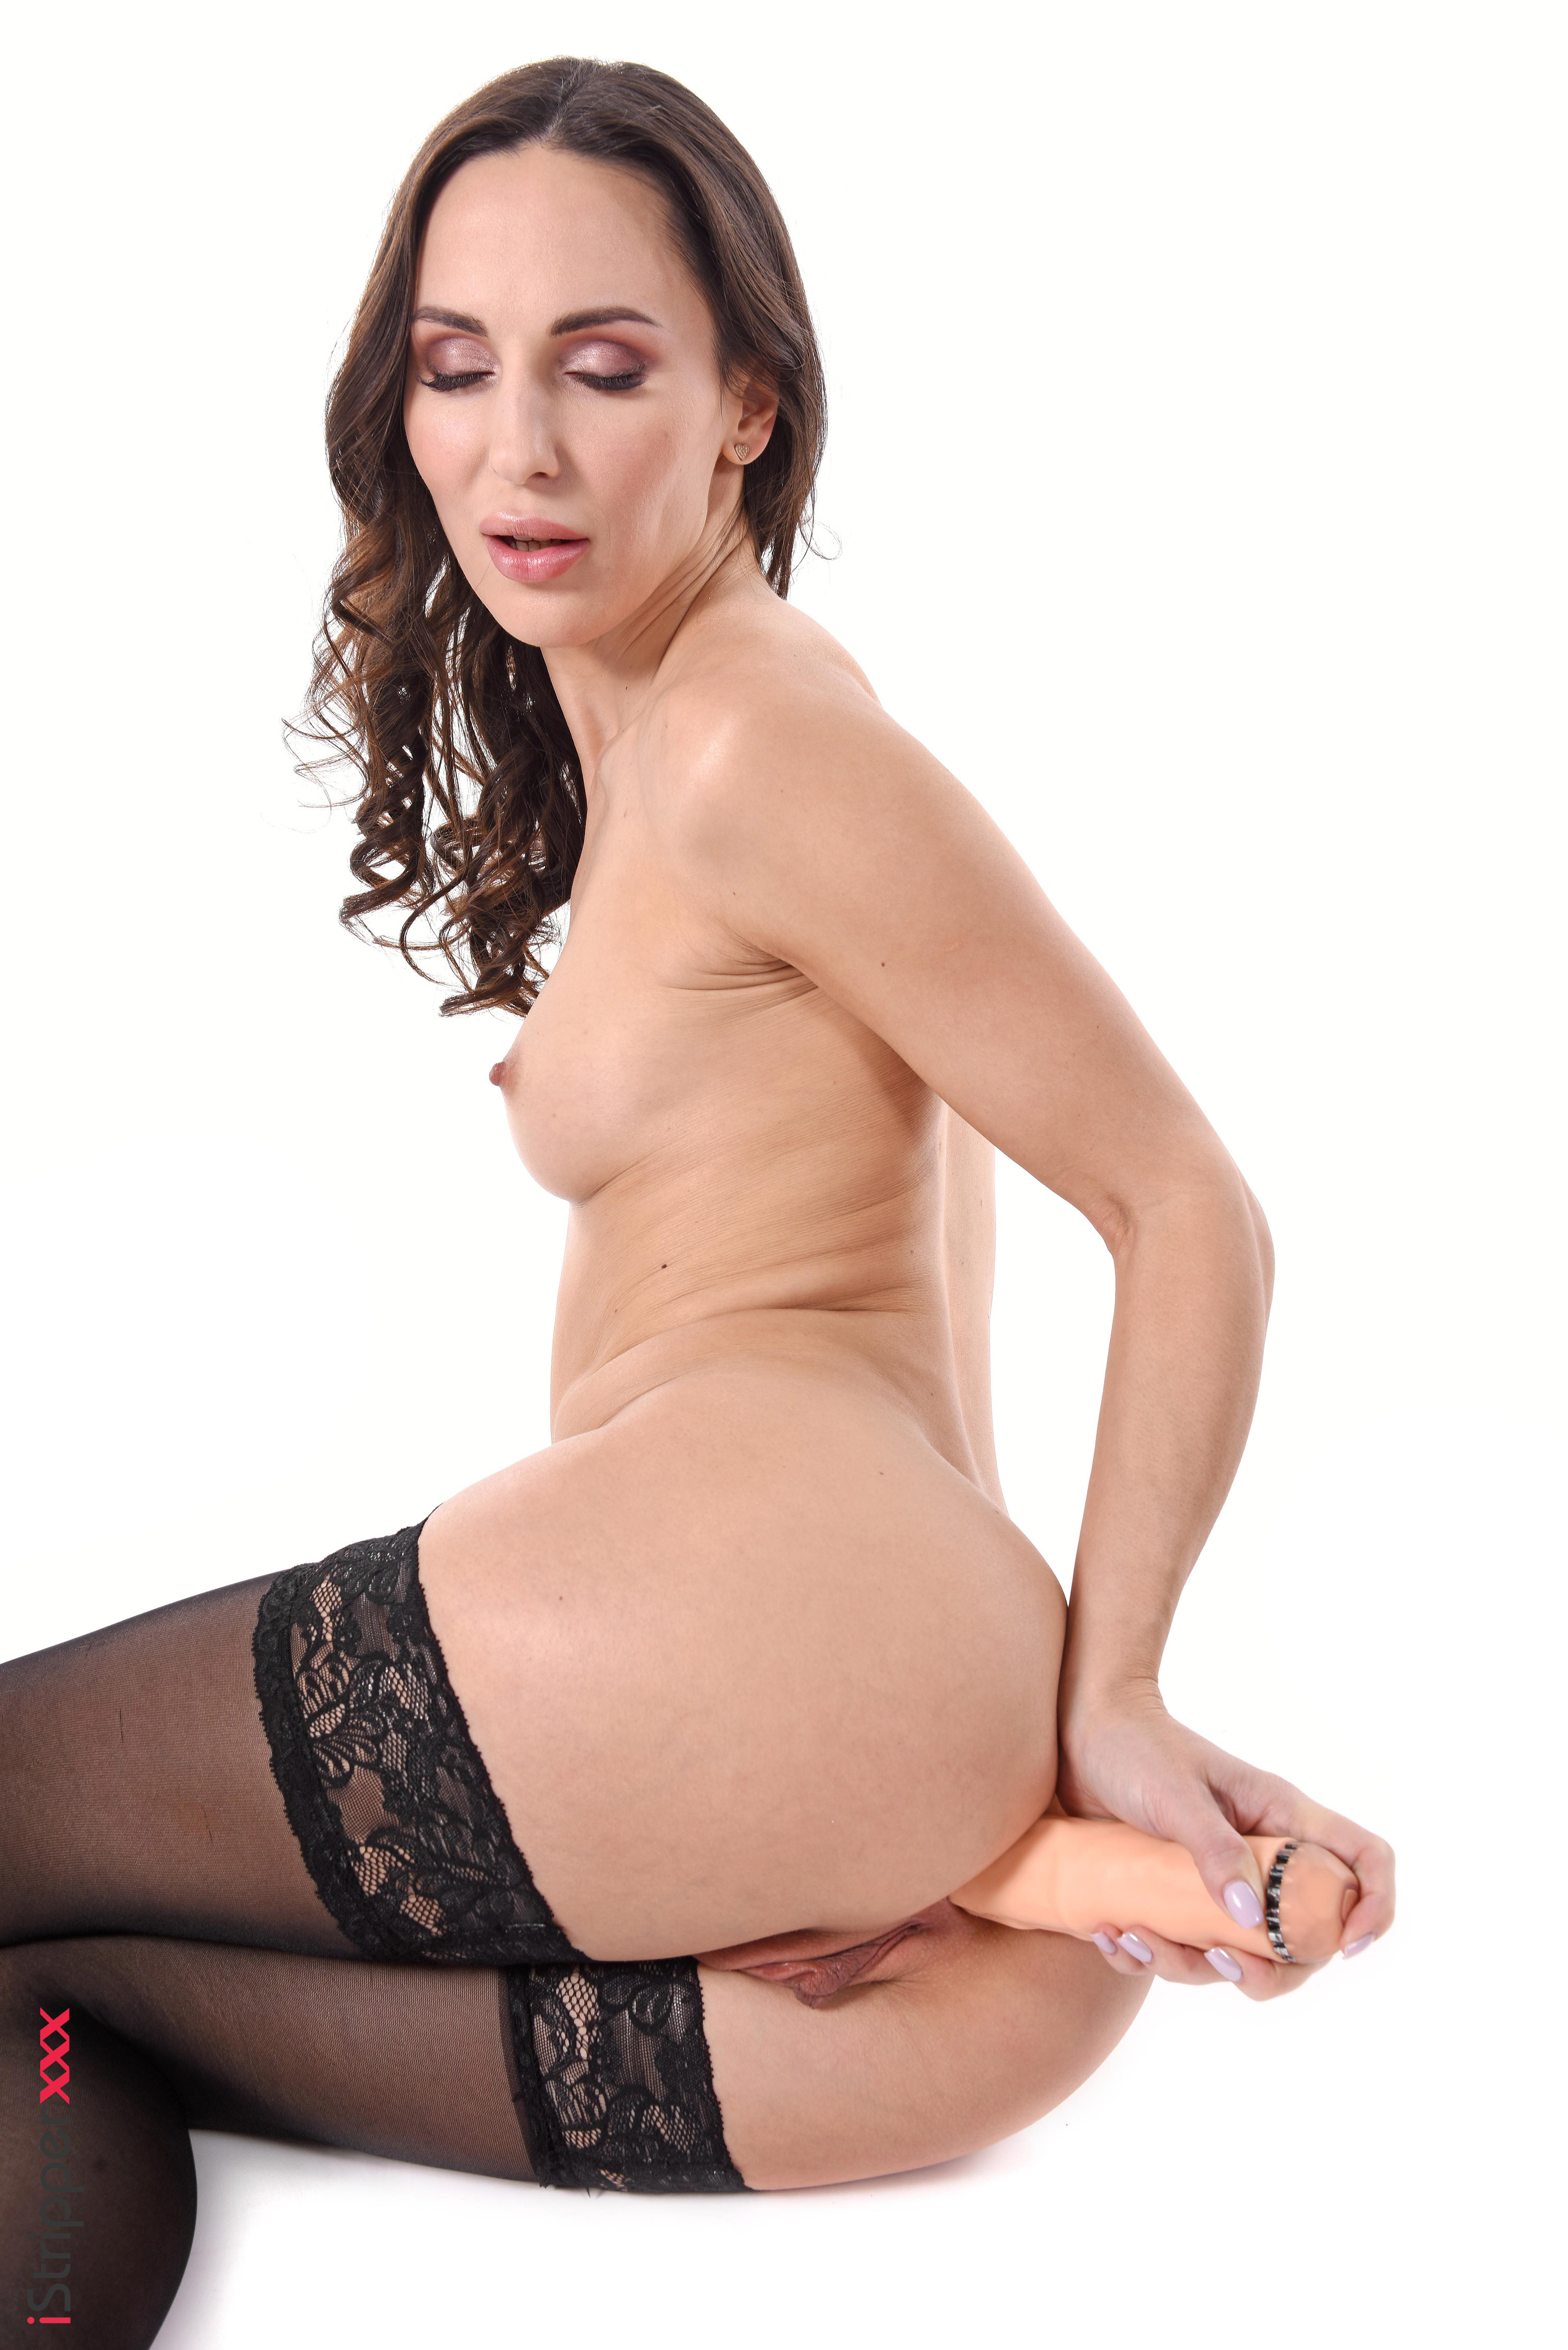 anastasia harris bikini